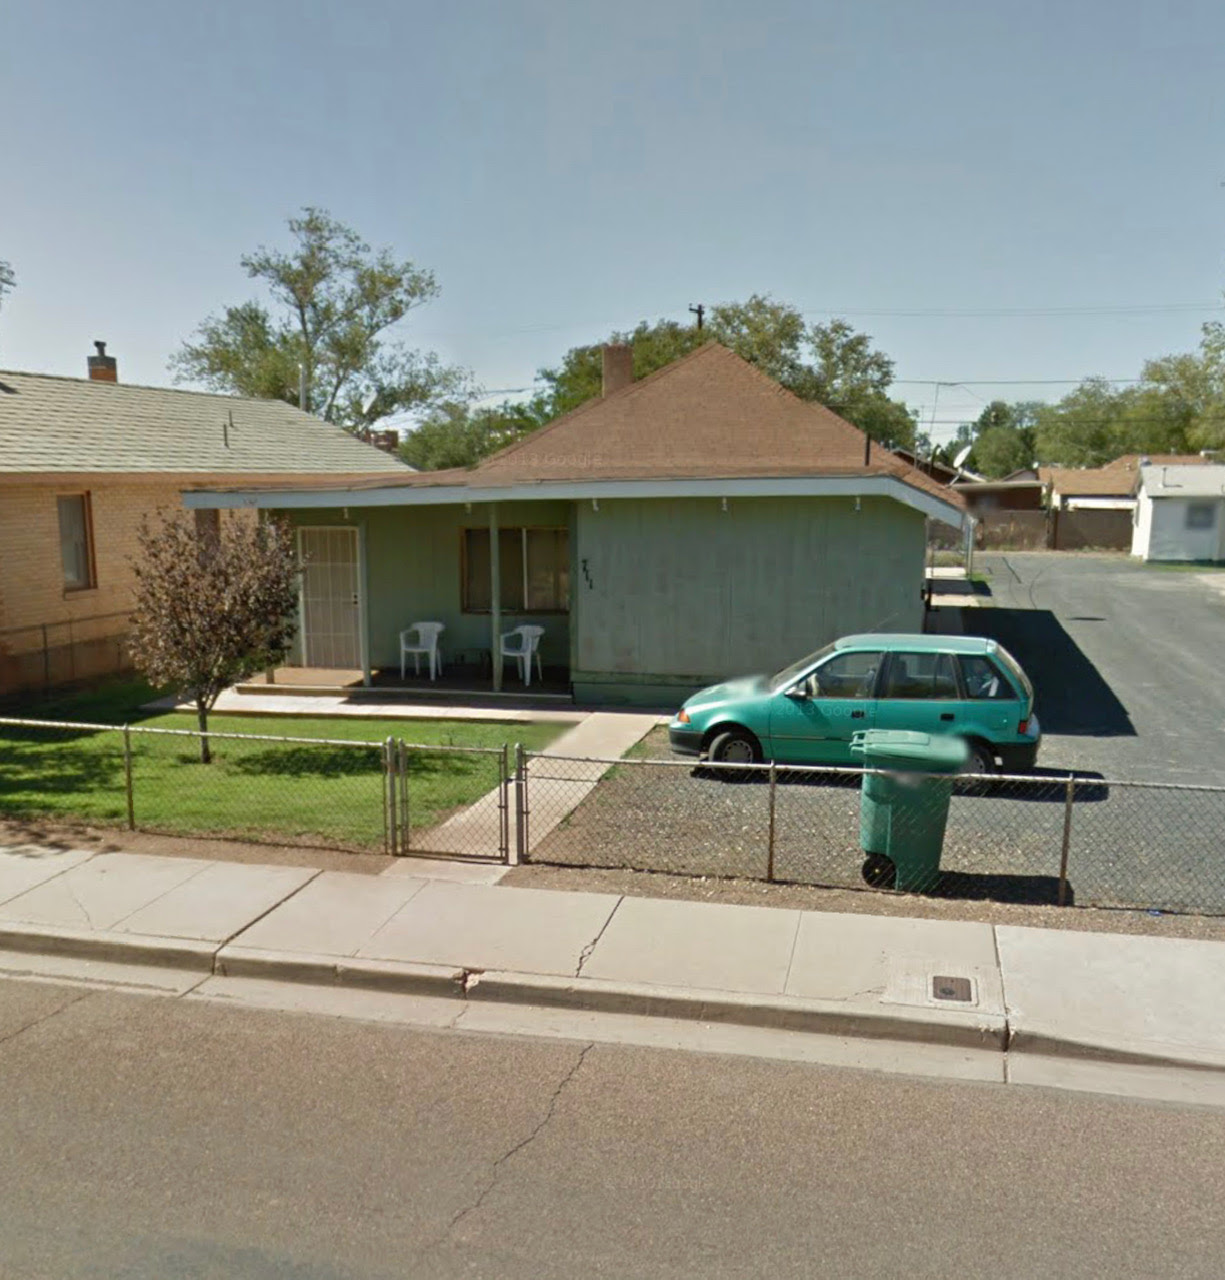 711 N Williamson Ave, Winslow, AZ 86047 wholesale priced listings